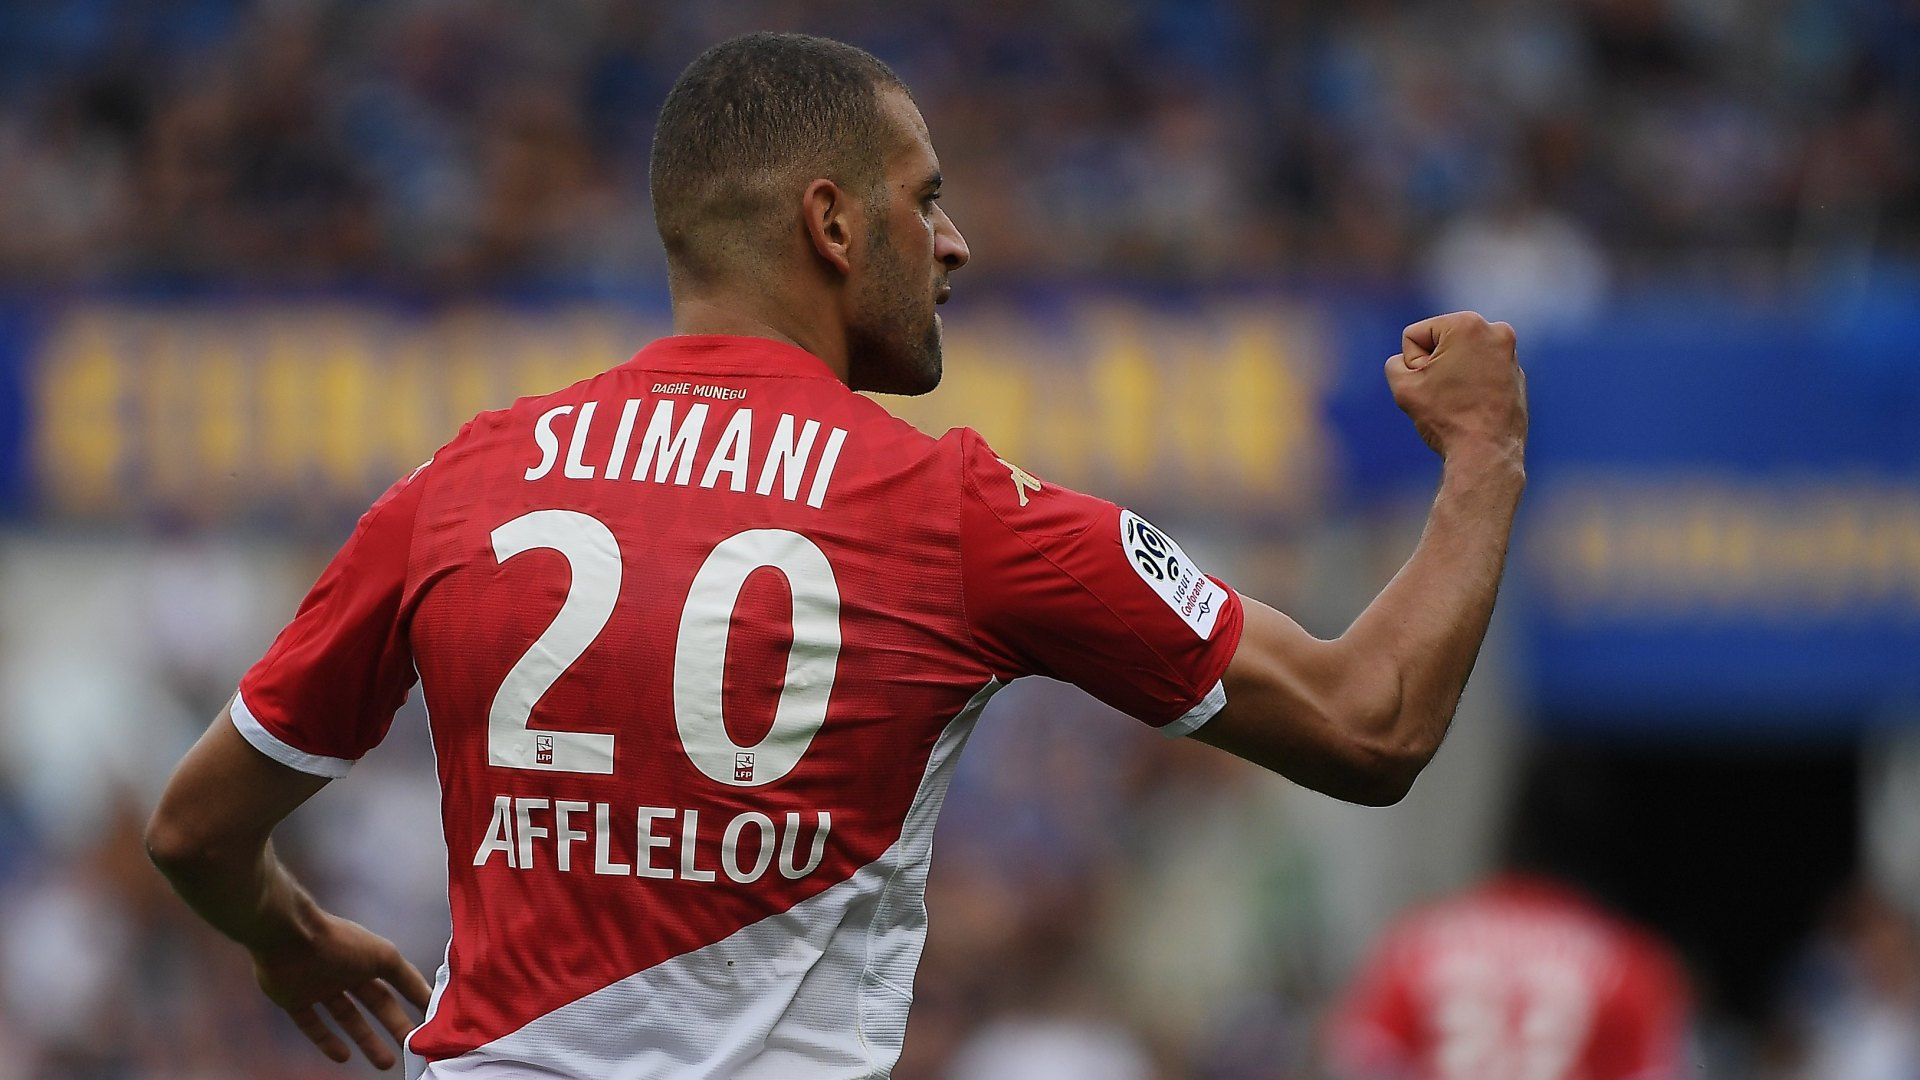 Monaco à Reims sans Ben Yedder et Slimani !